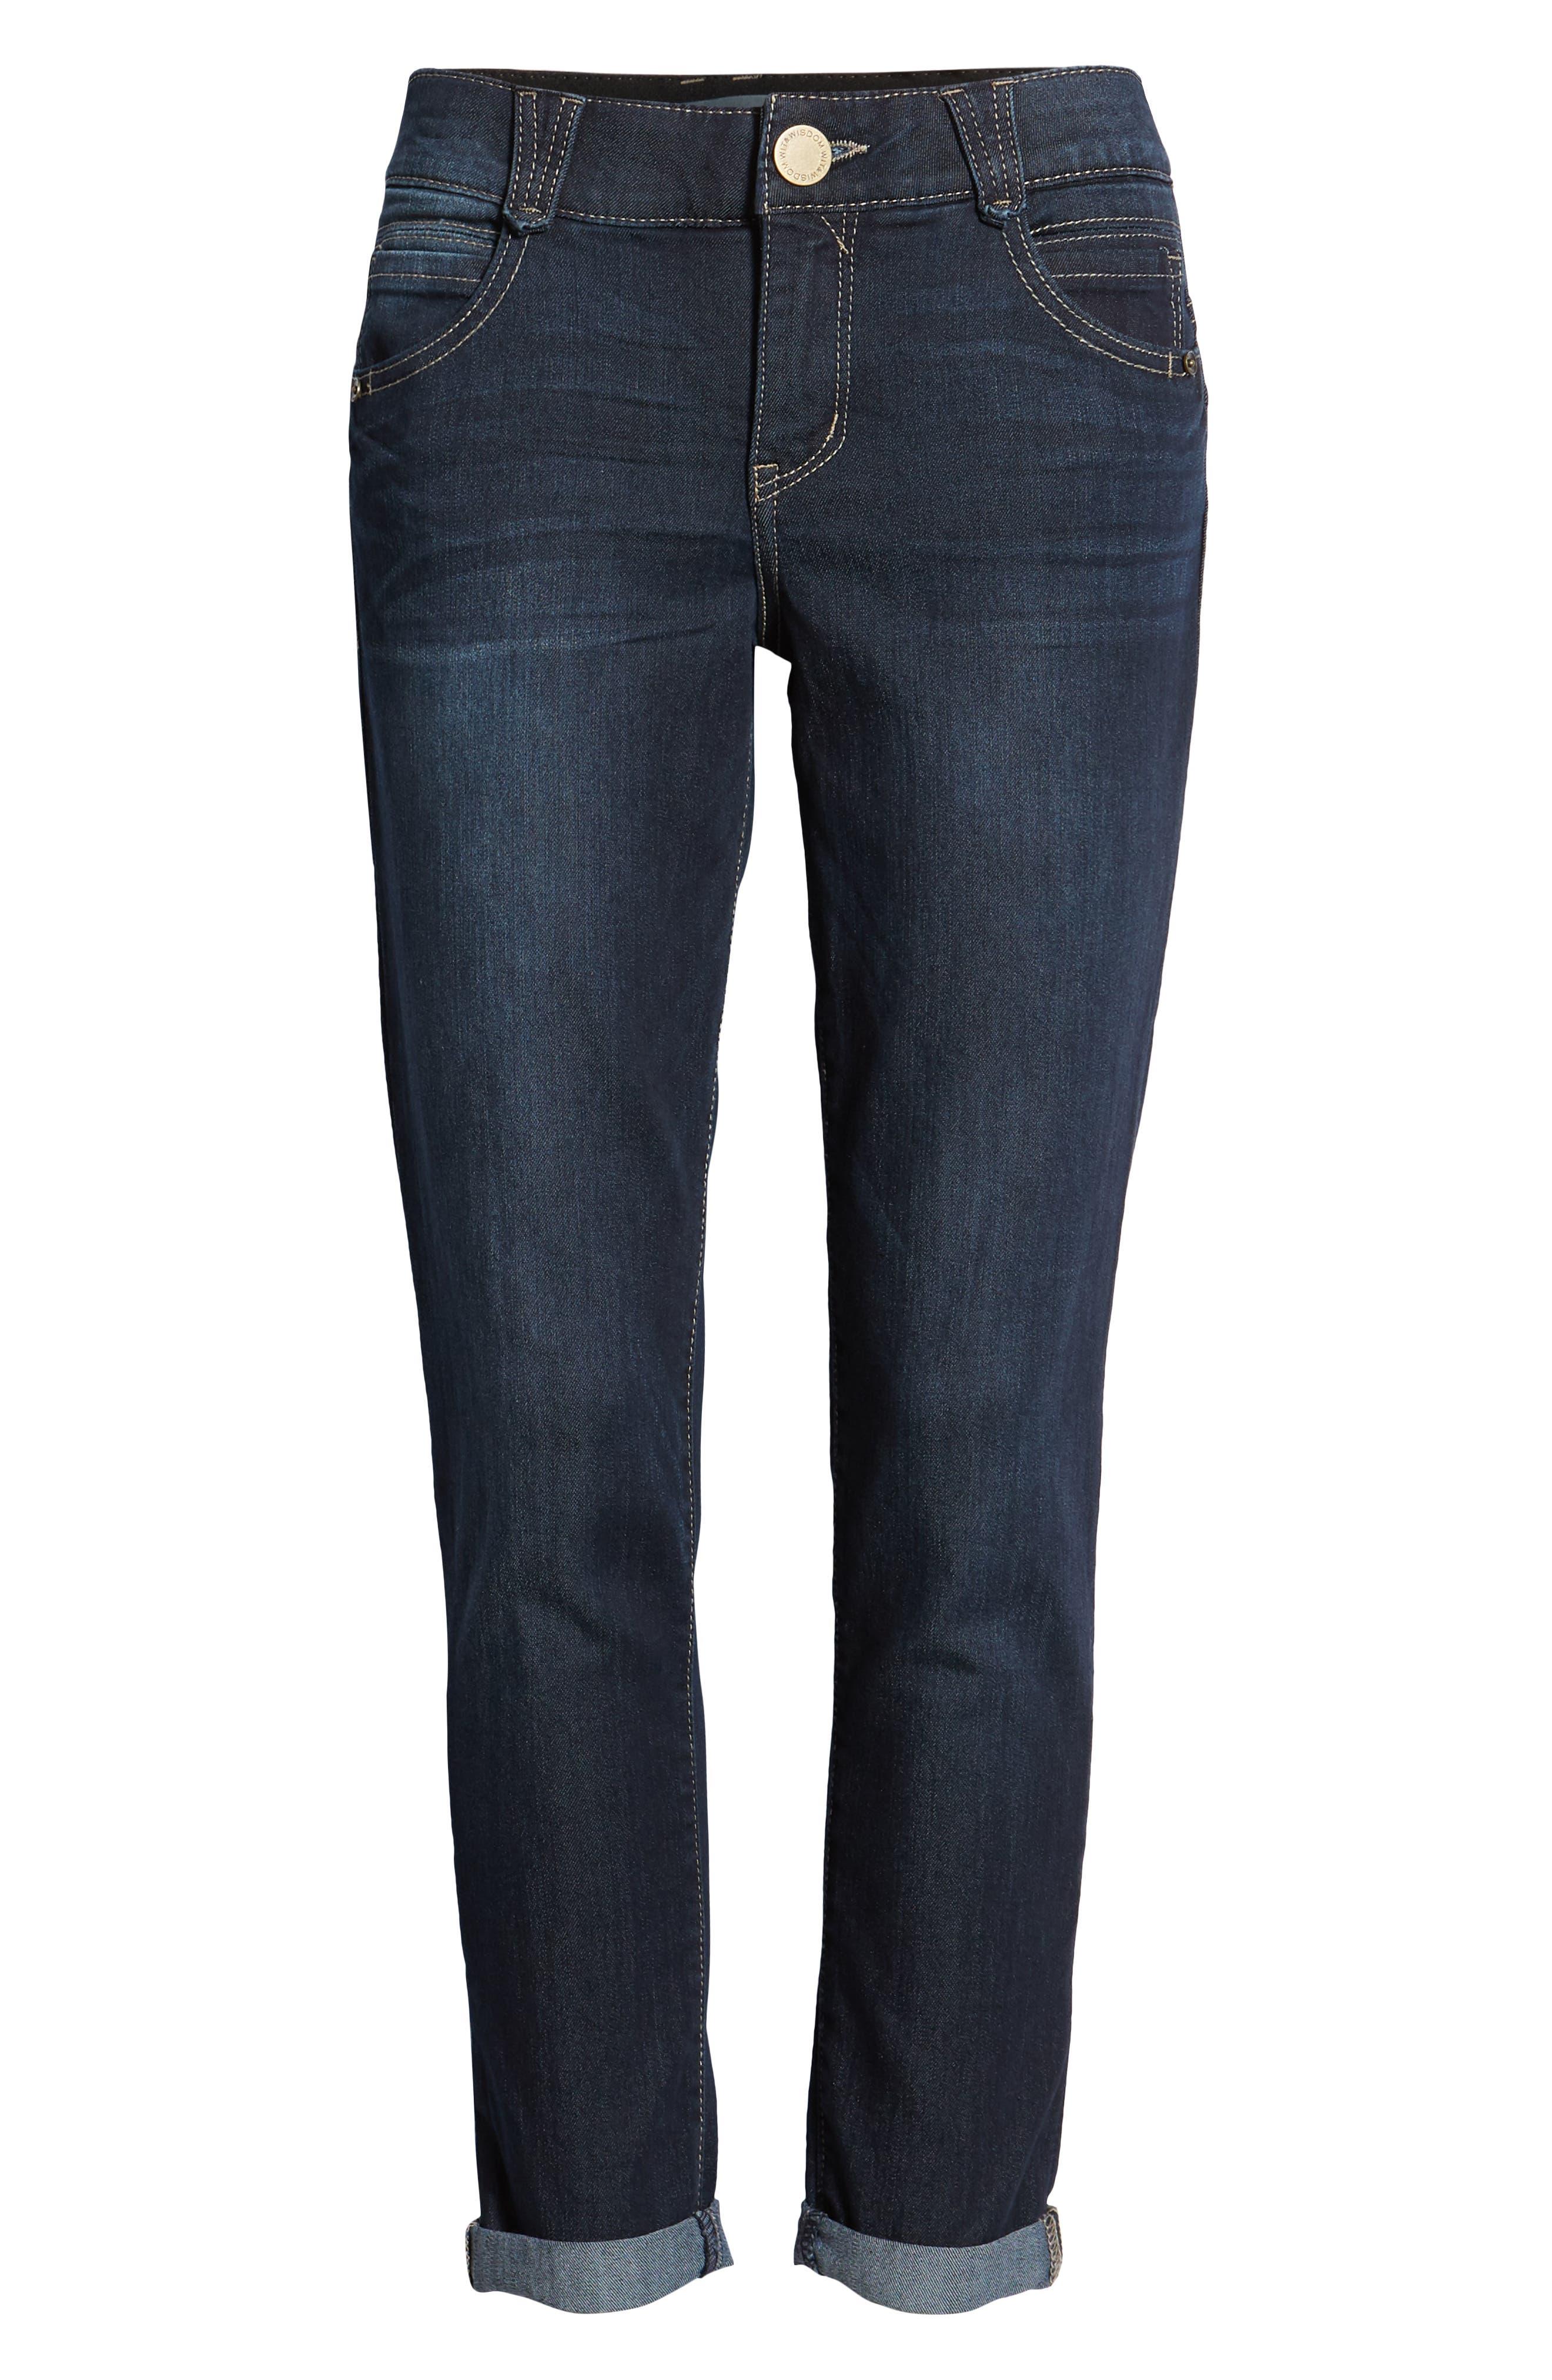 Ab-Solution Ankle Skimmer Jeans,                             Alternate thumbnail 7, color,                             INDIGO